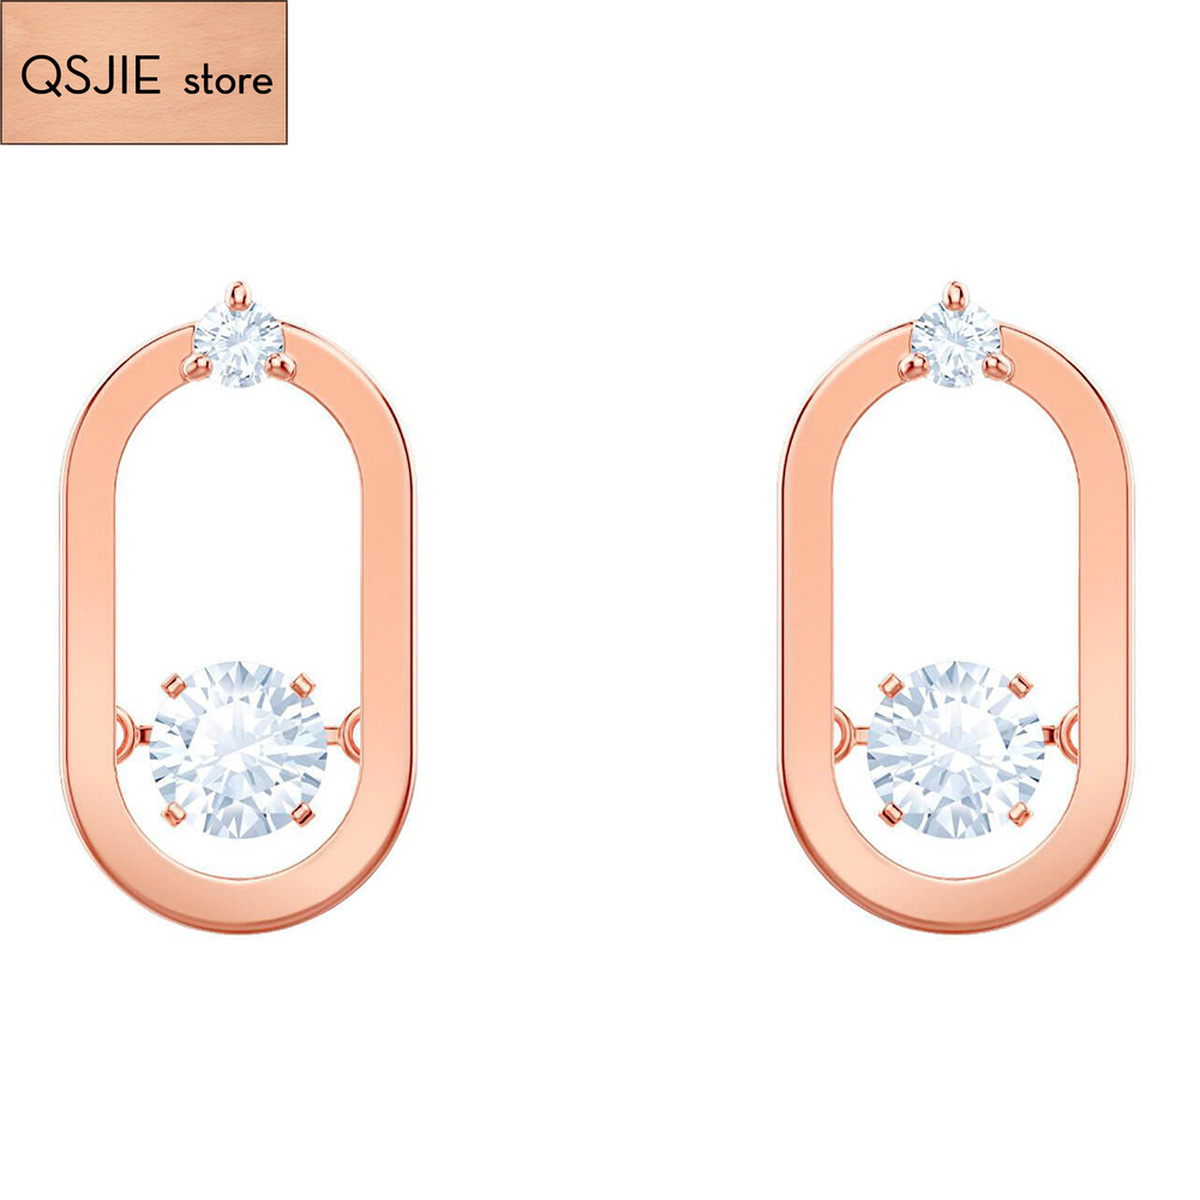 QSJIE High quality SWA, shiny romantic new heartbeat Earrings Glamorous fashion jewelry